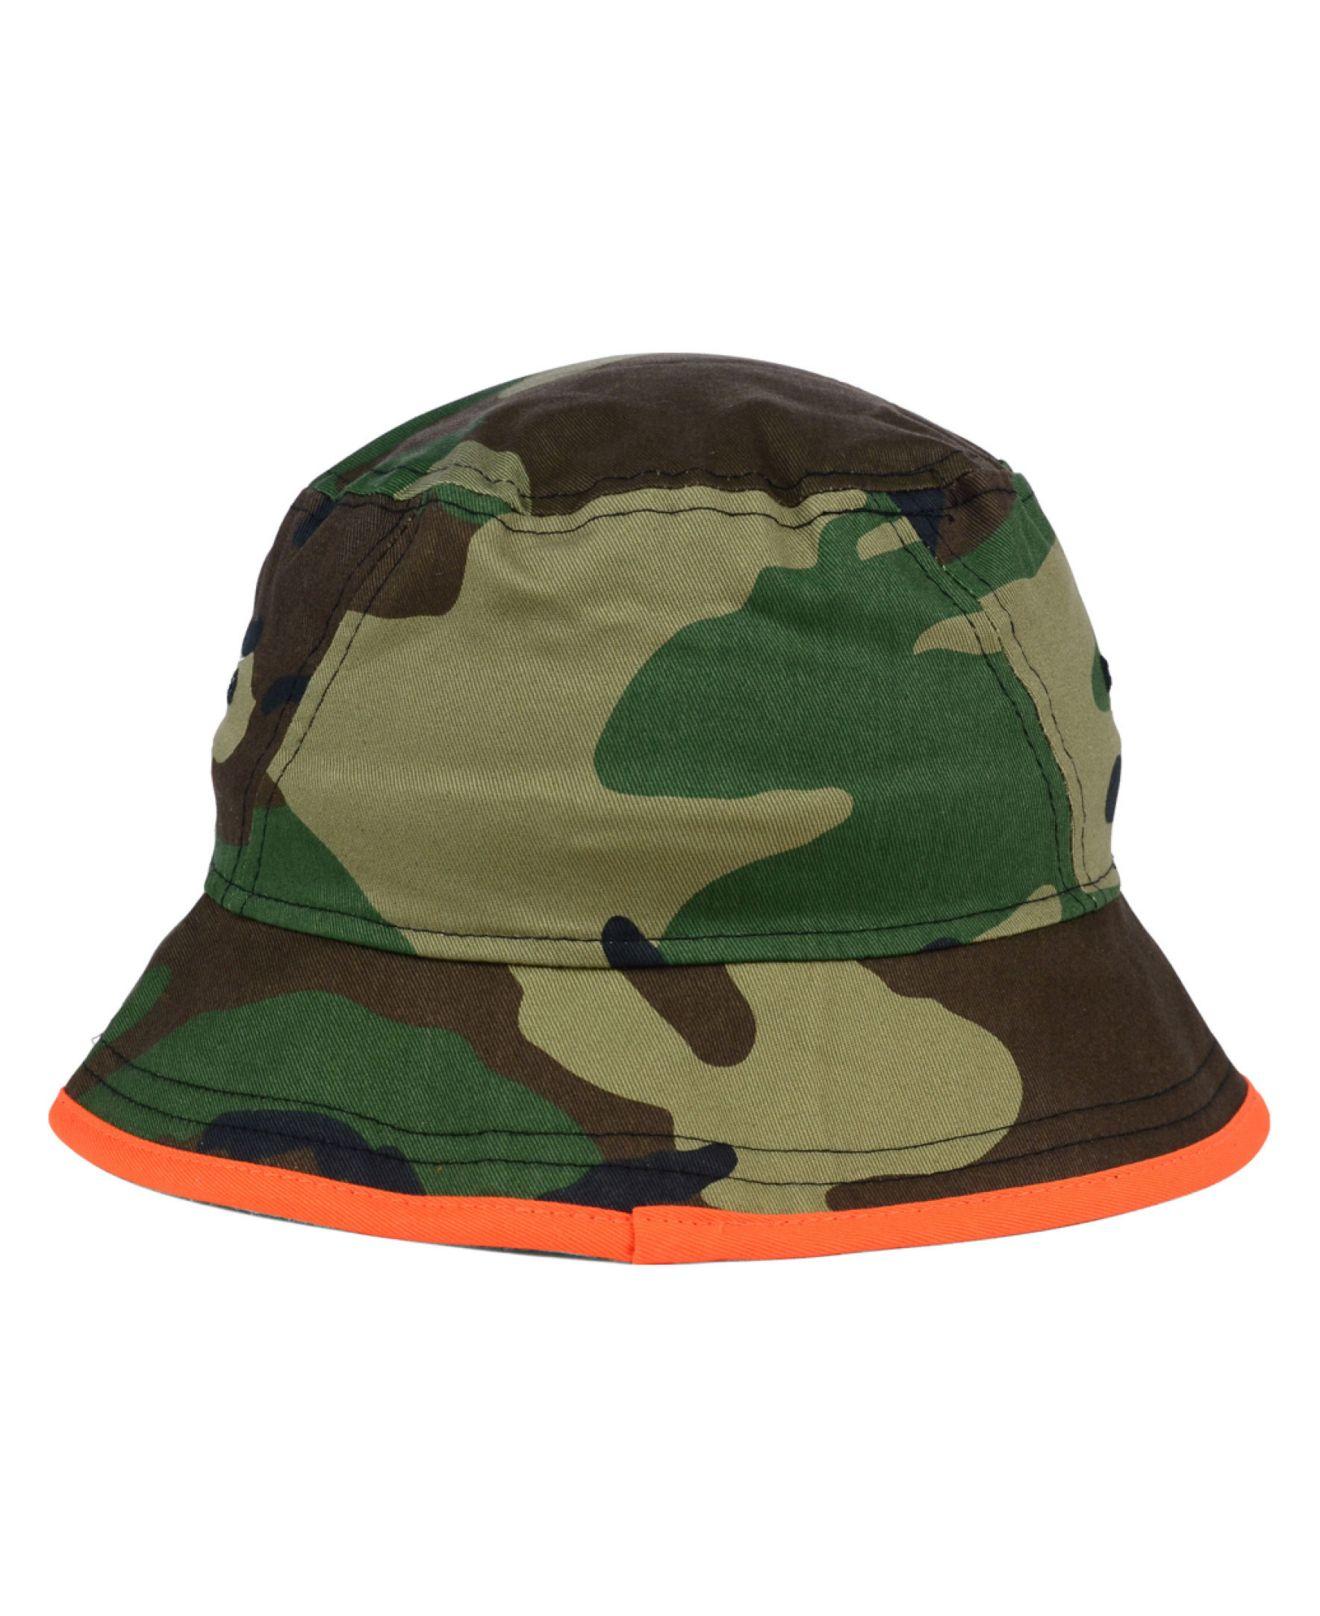 czech lyst ktz cincinnati bengals camo pop bucket hat in green for men  0b860 d4337 323bc99cb